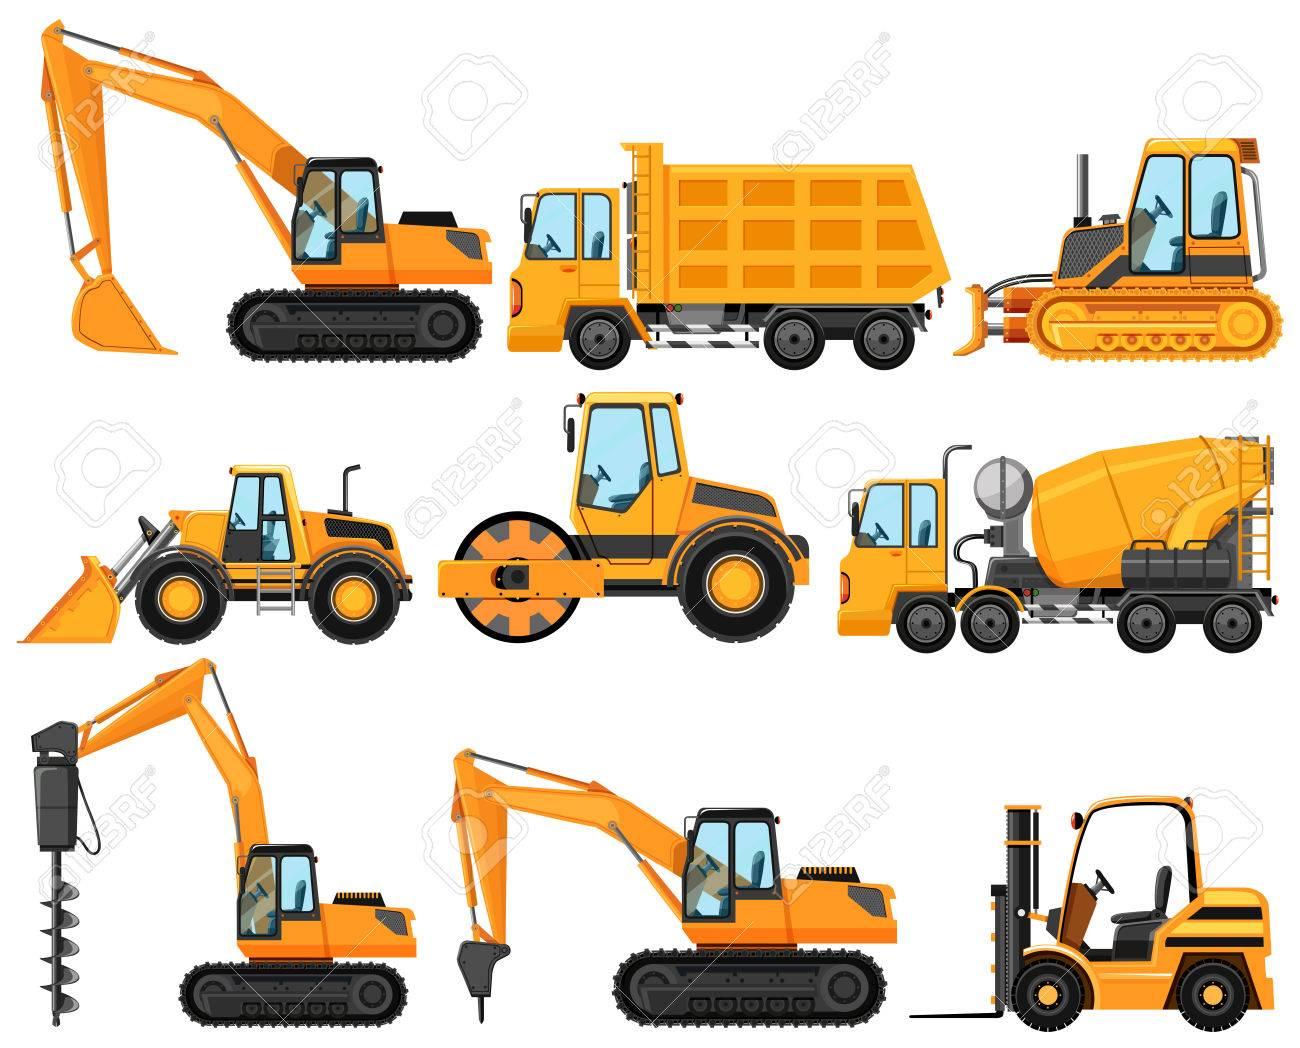 Different types of construction trucks illustration.